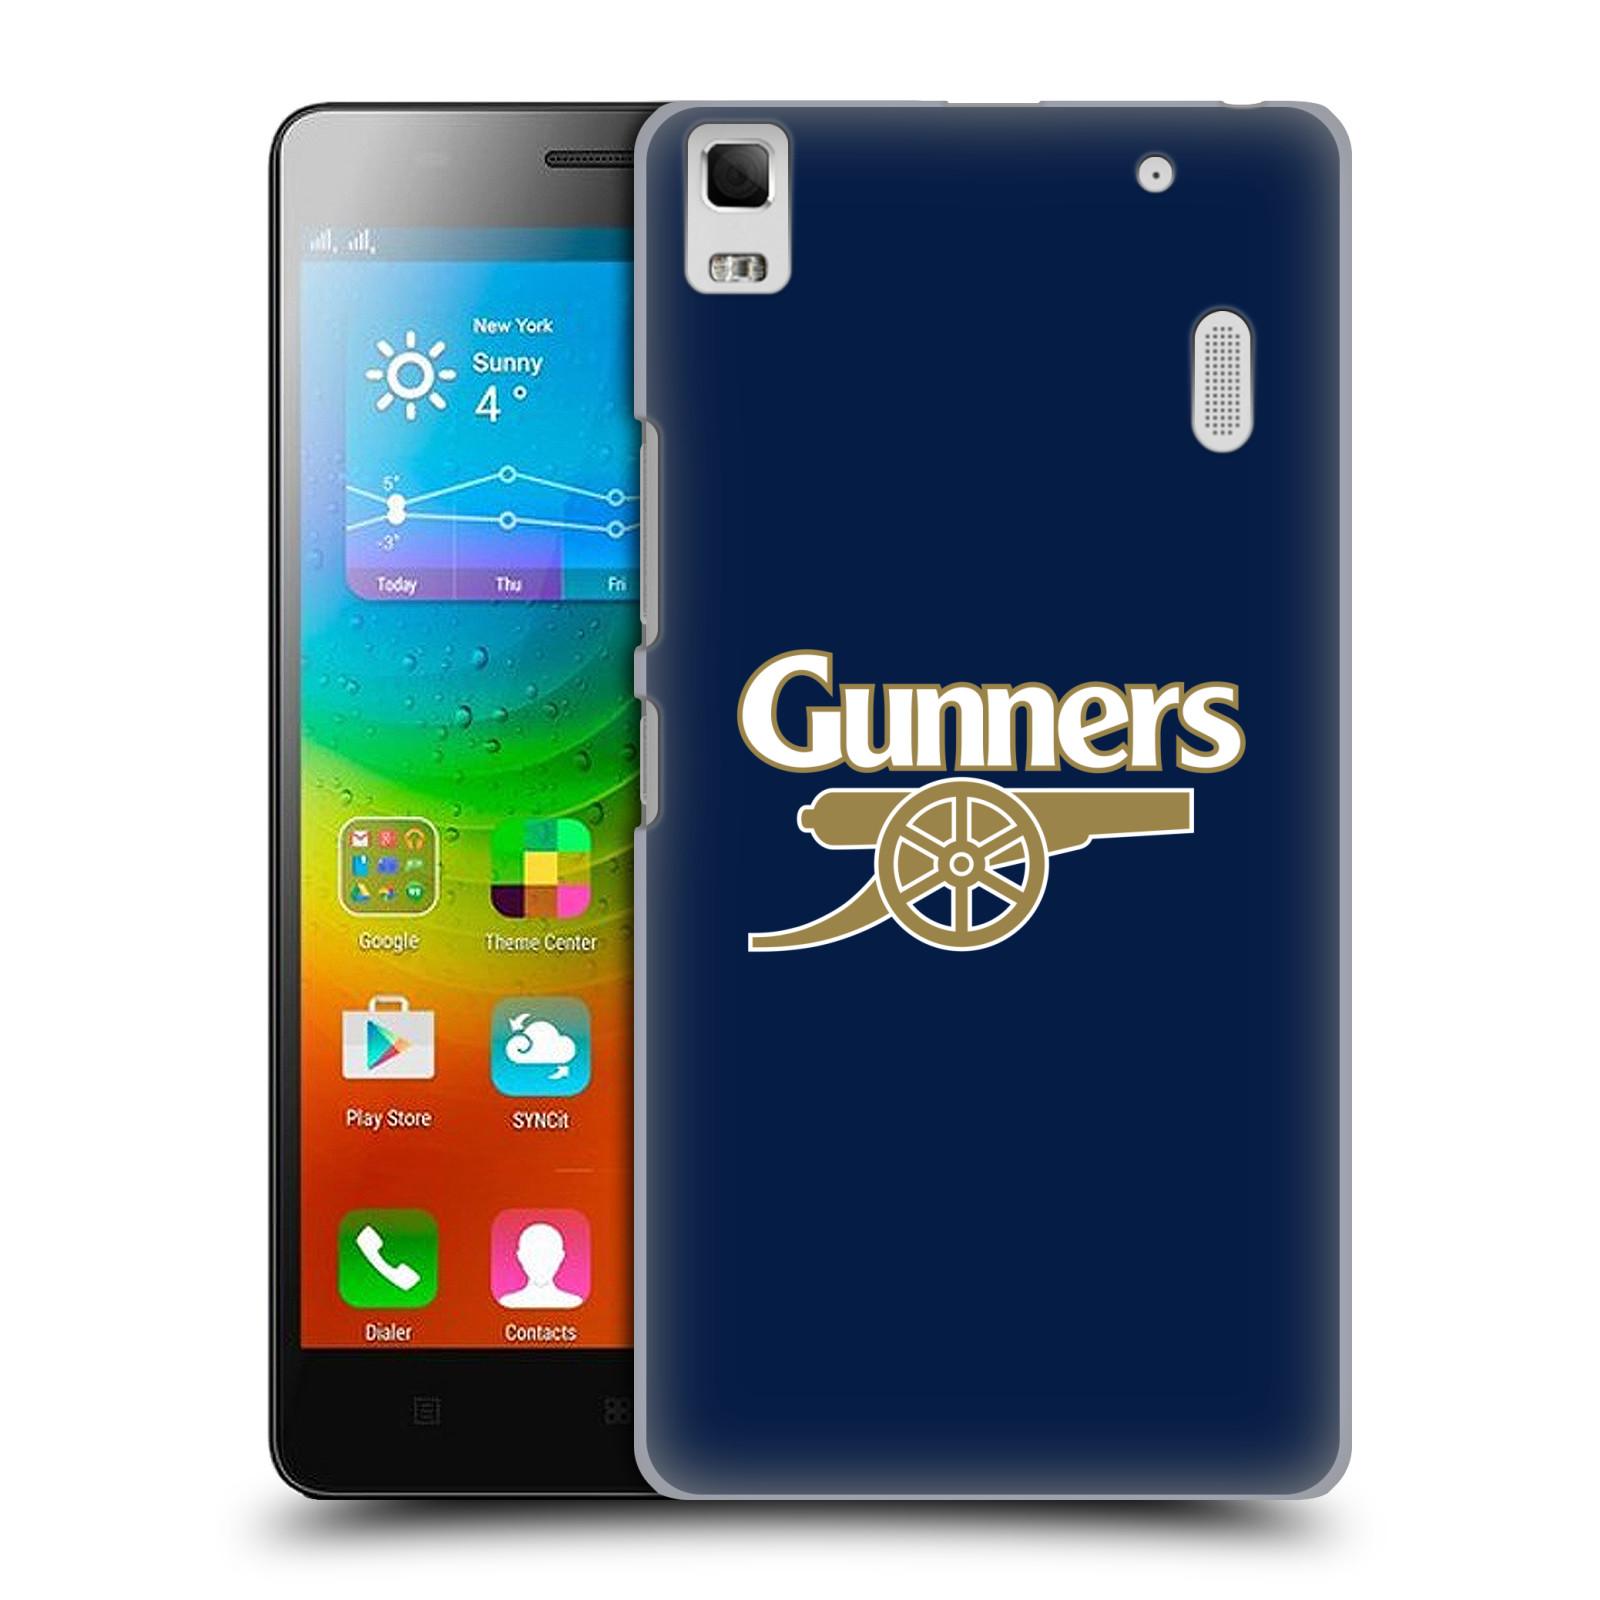 Plastové pouzdro na mobil Lenovo A7000 - Head Case - Arsenal FC - Gunners